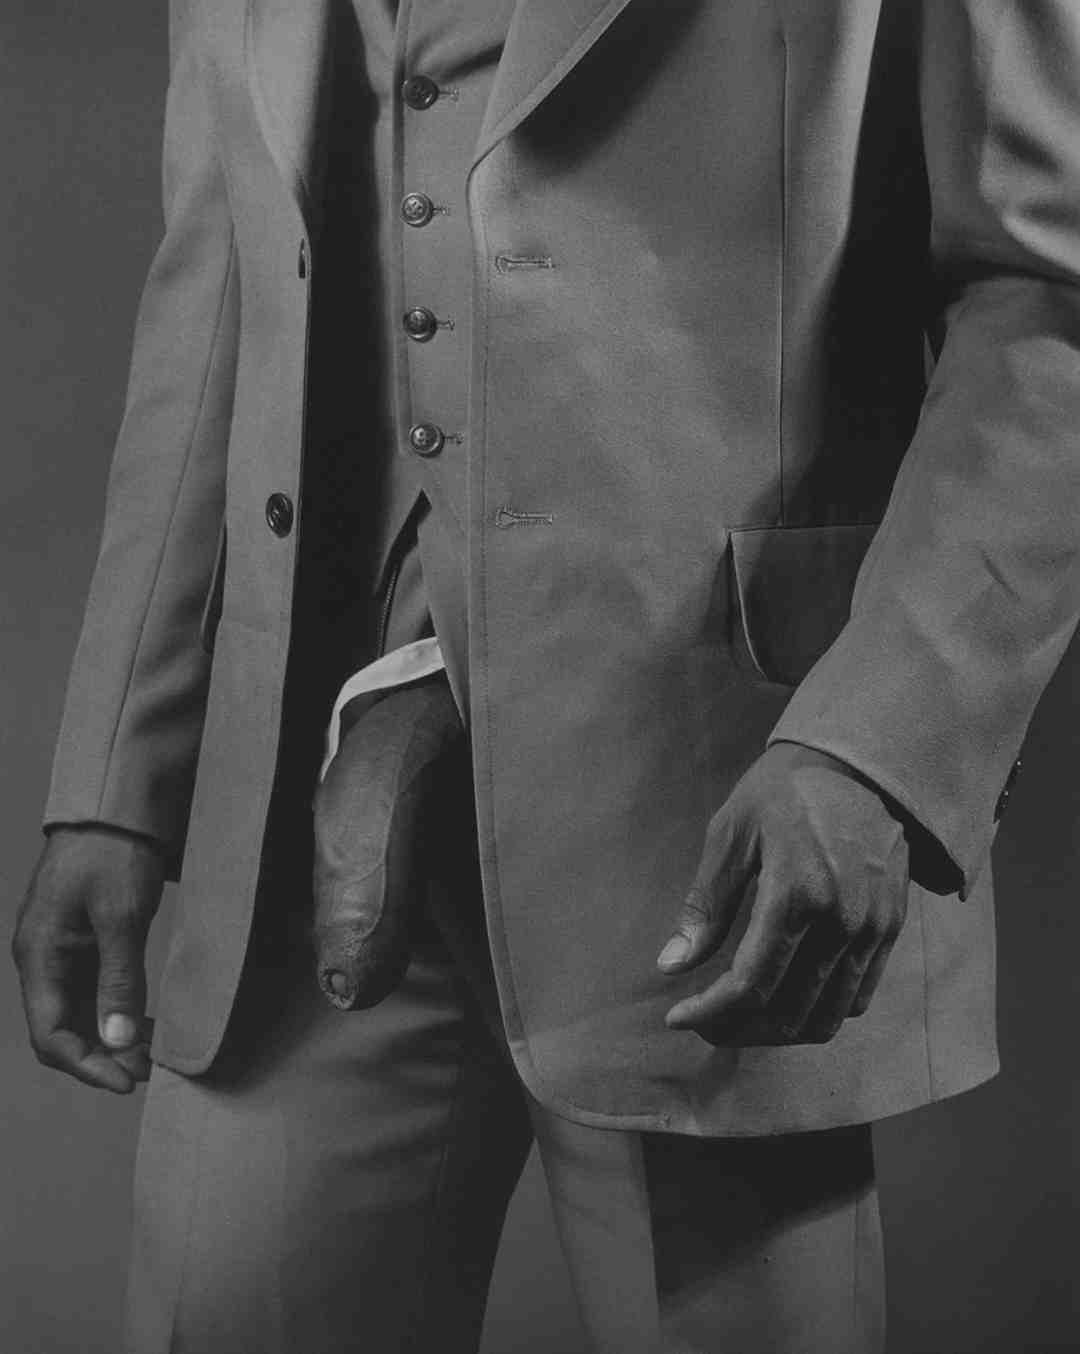 Robert Mapplethorpe, Man in polyester suite, 1980, cm 51x41, gelatin silver print, ed. 3/15, Courtesy Collezione Ettore Molinario, ©The Estate of Robert Mapplethorpe